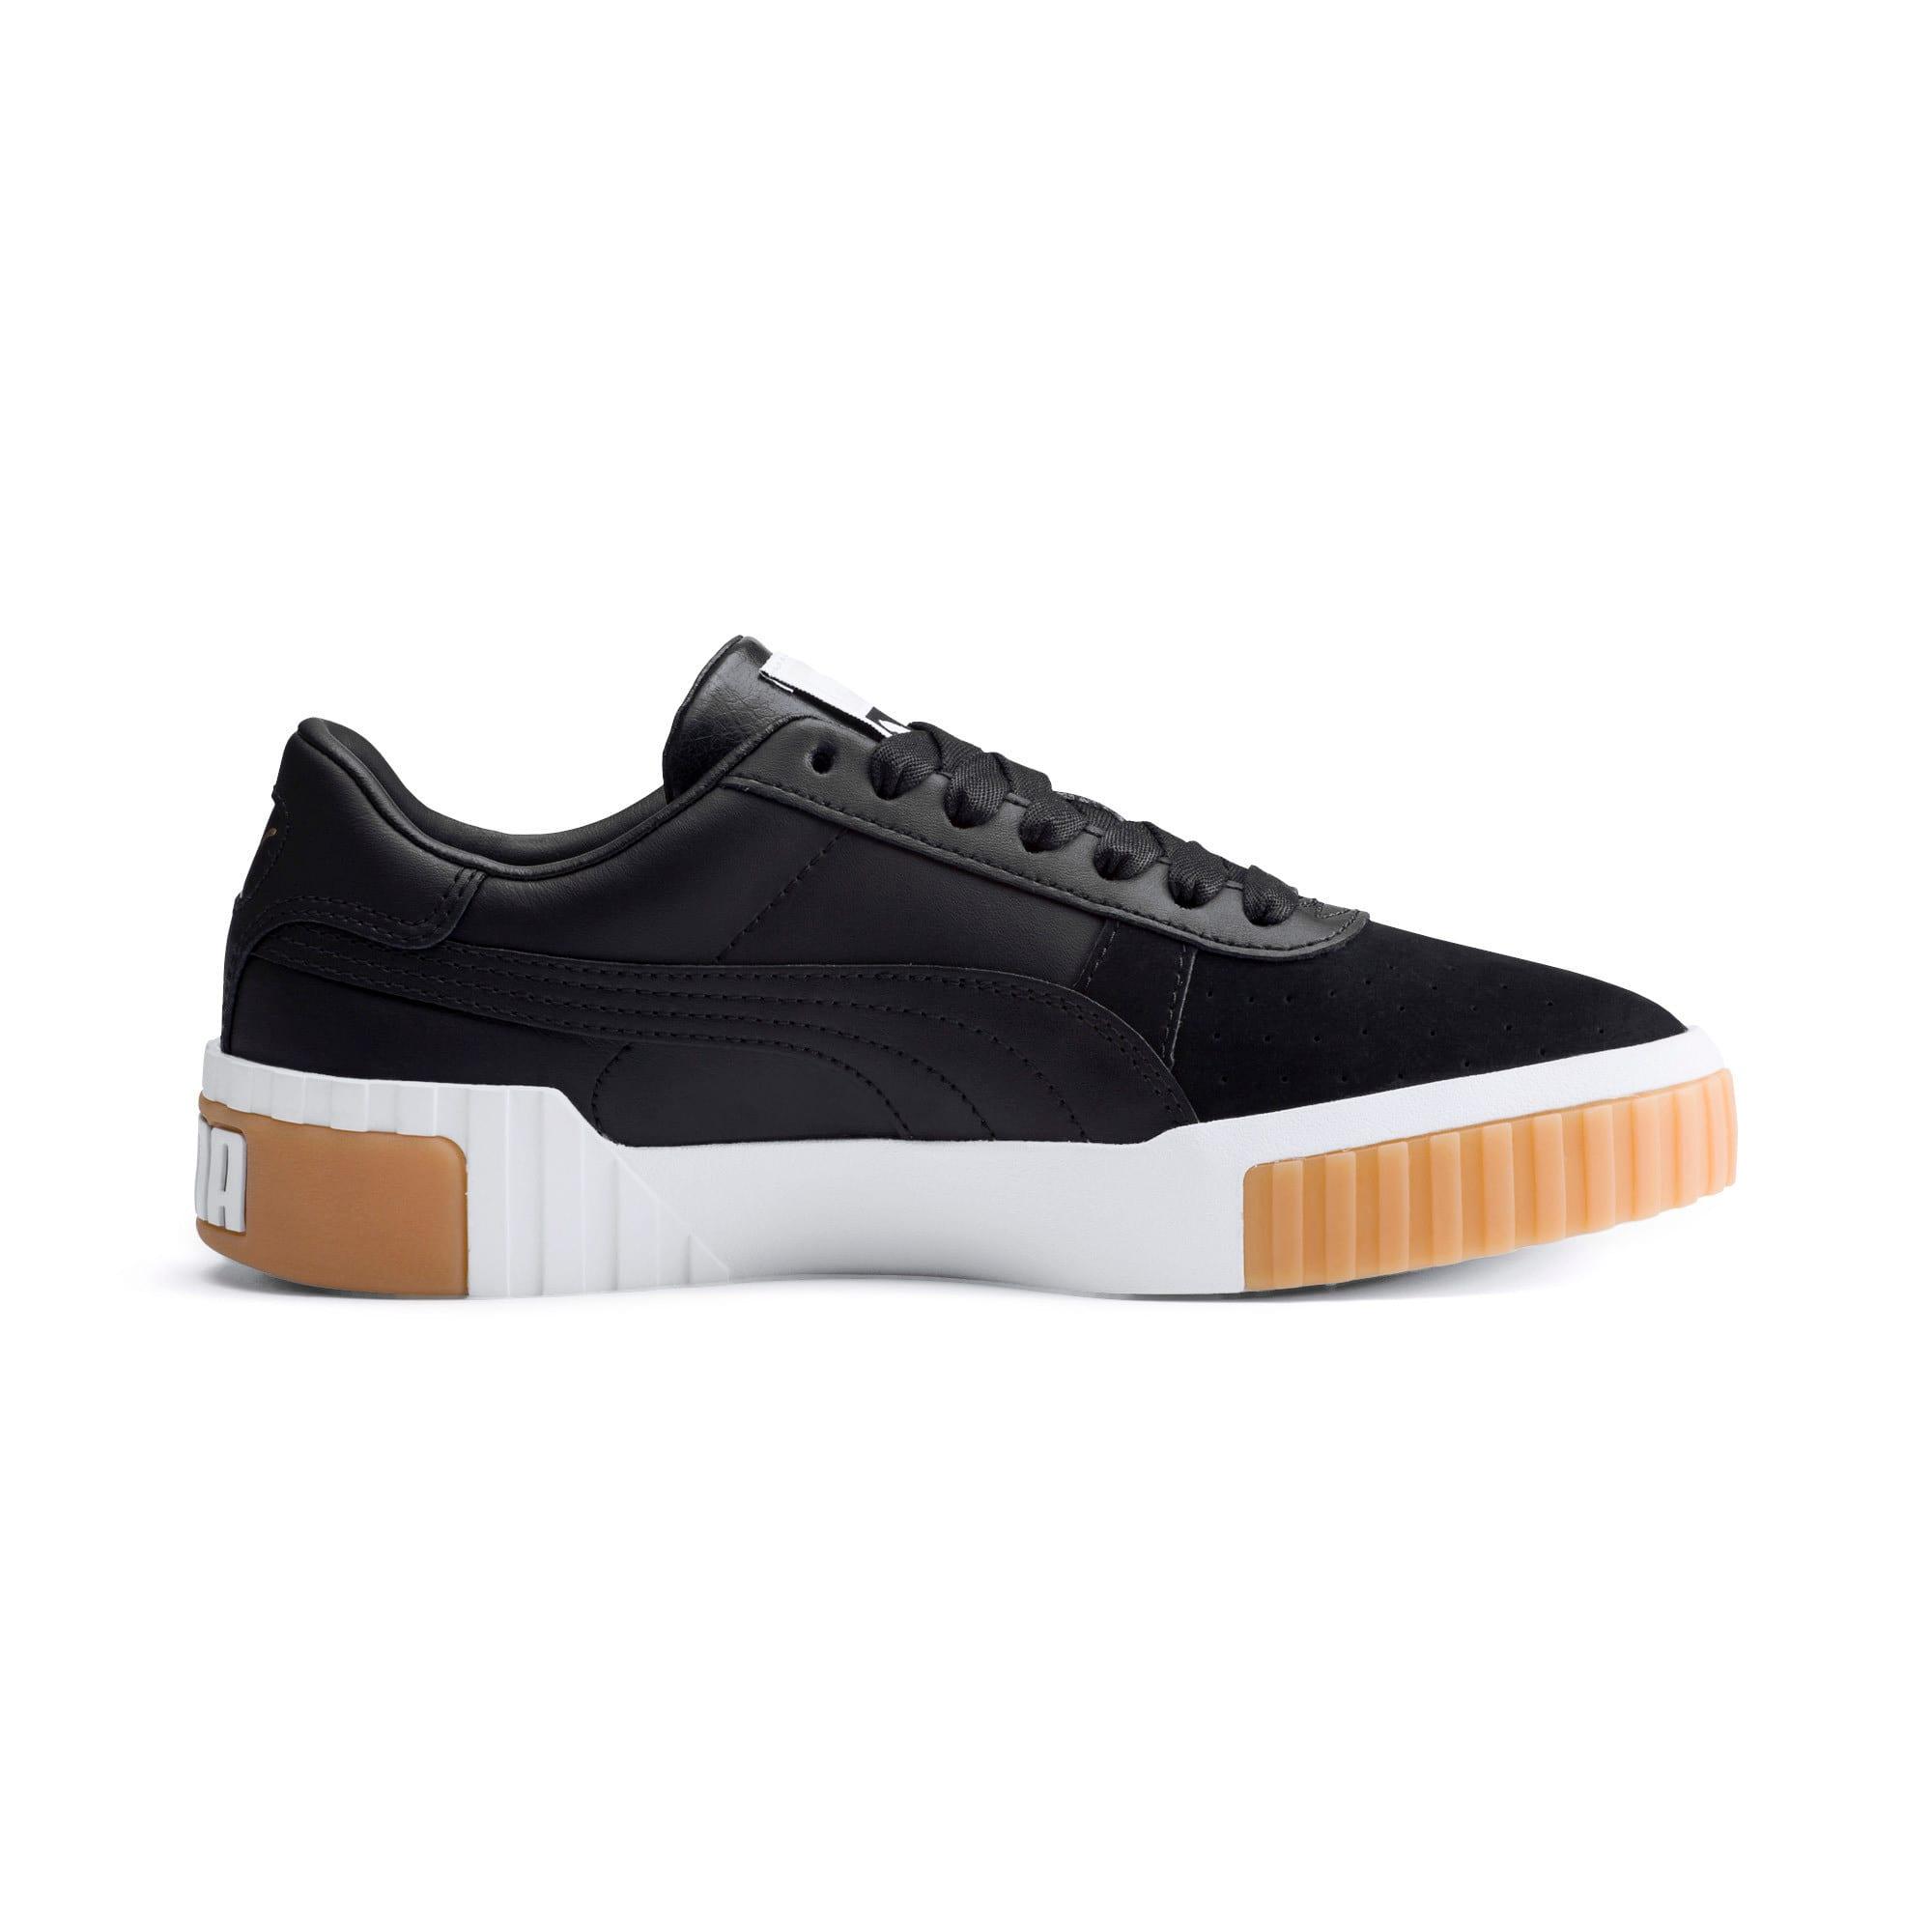 Thumbnail 5 of Cali Exotic Women's Sneakers, Puma Black-Puma Black, medium